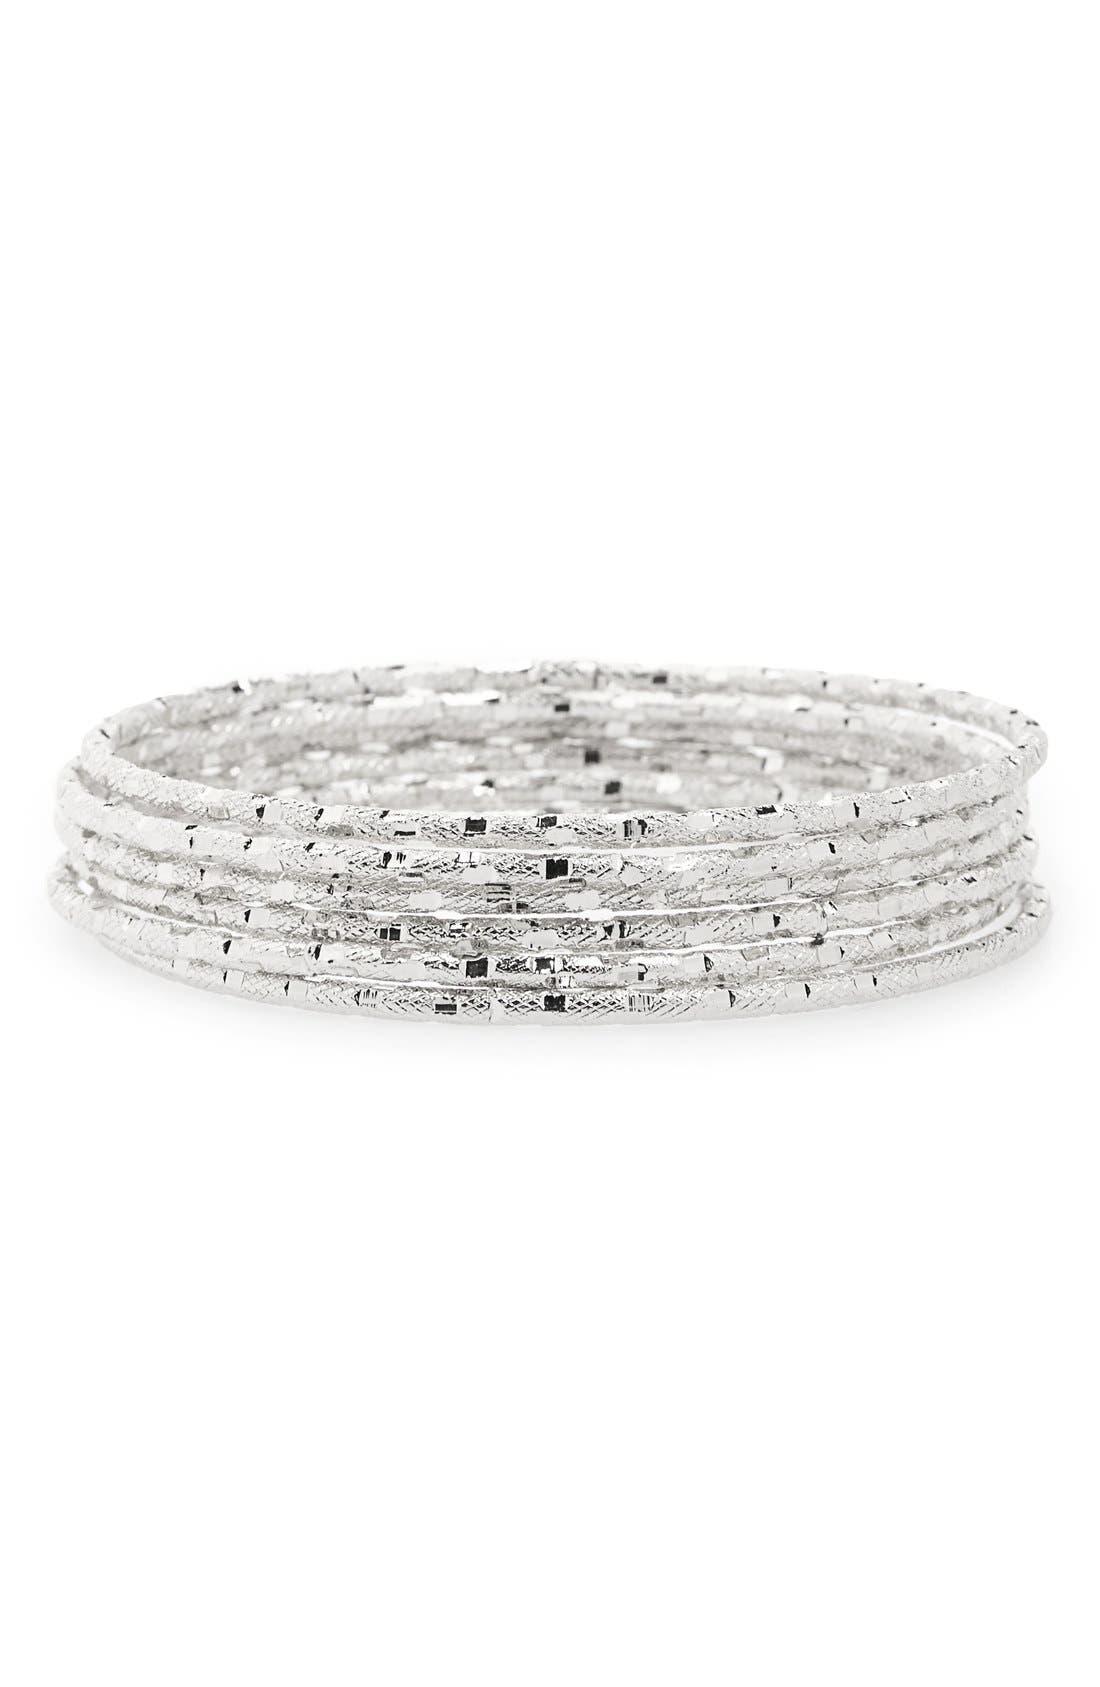 Alternate Image 1 Selected - Panacea Diamond Cut Textured Bangles (Set of 6)